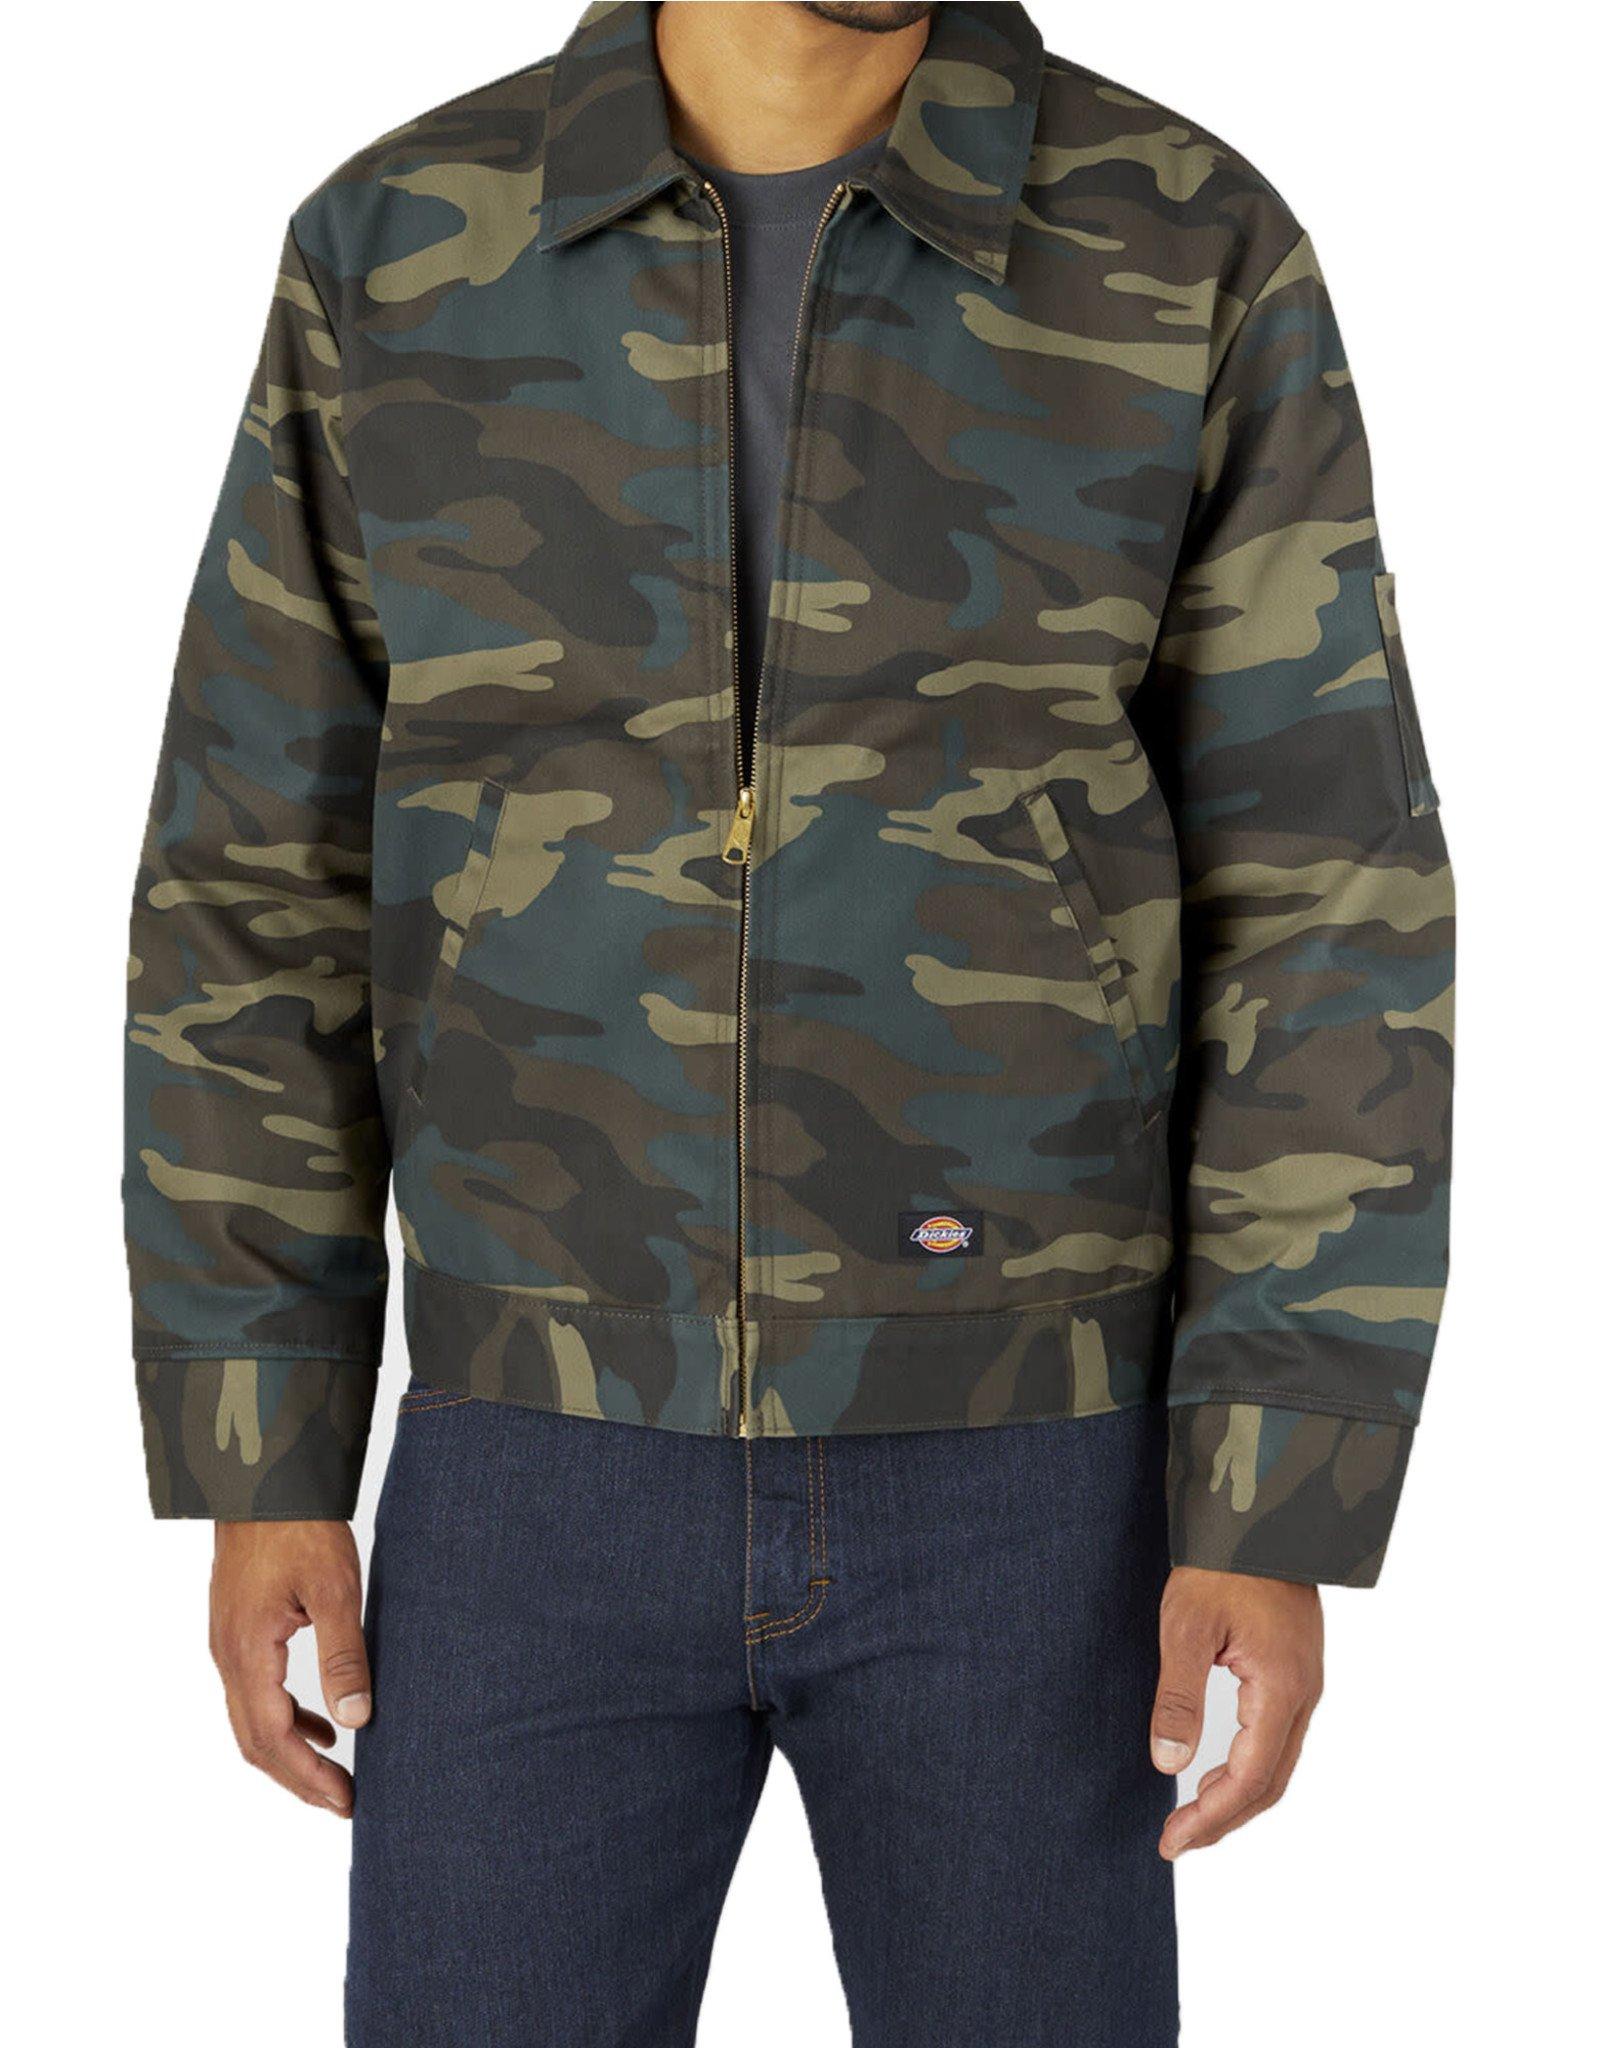 DICKIES Insulated Eisenhower Jacket Hunter Green Camo